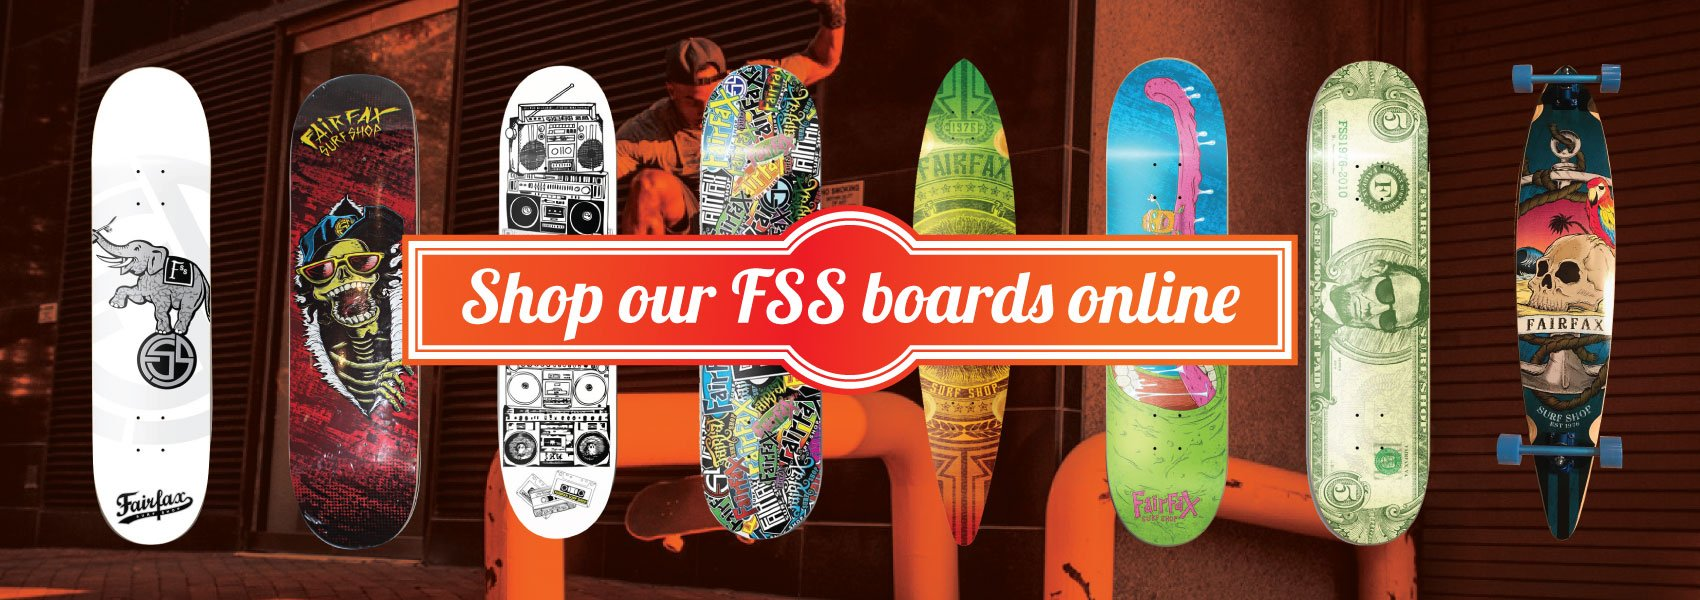 shop boards online